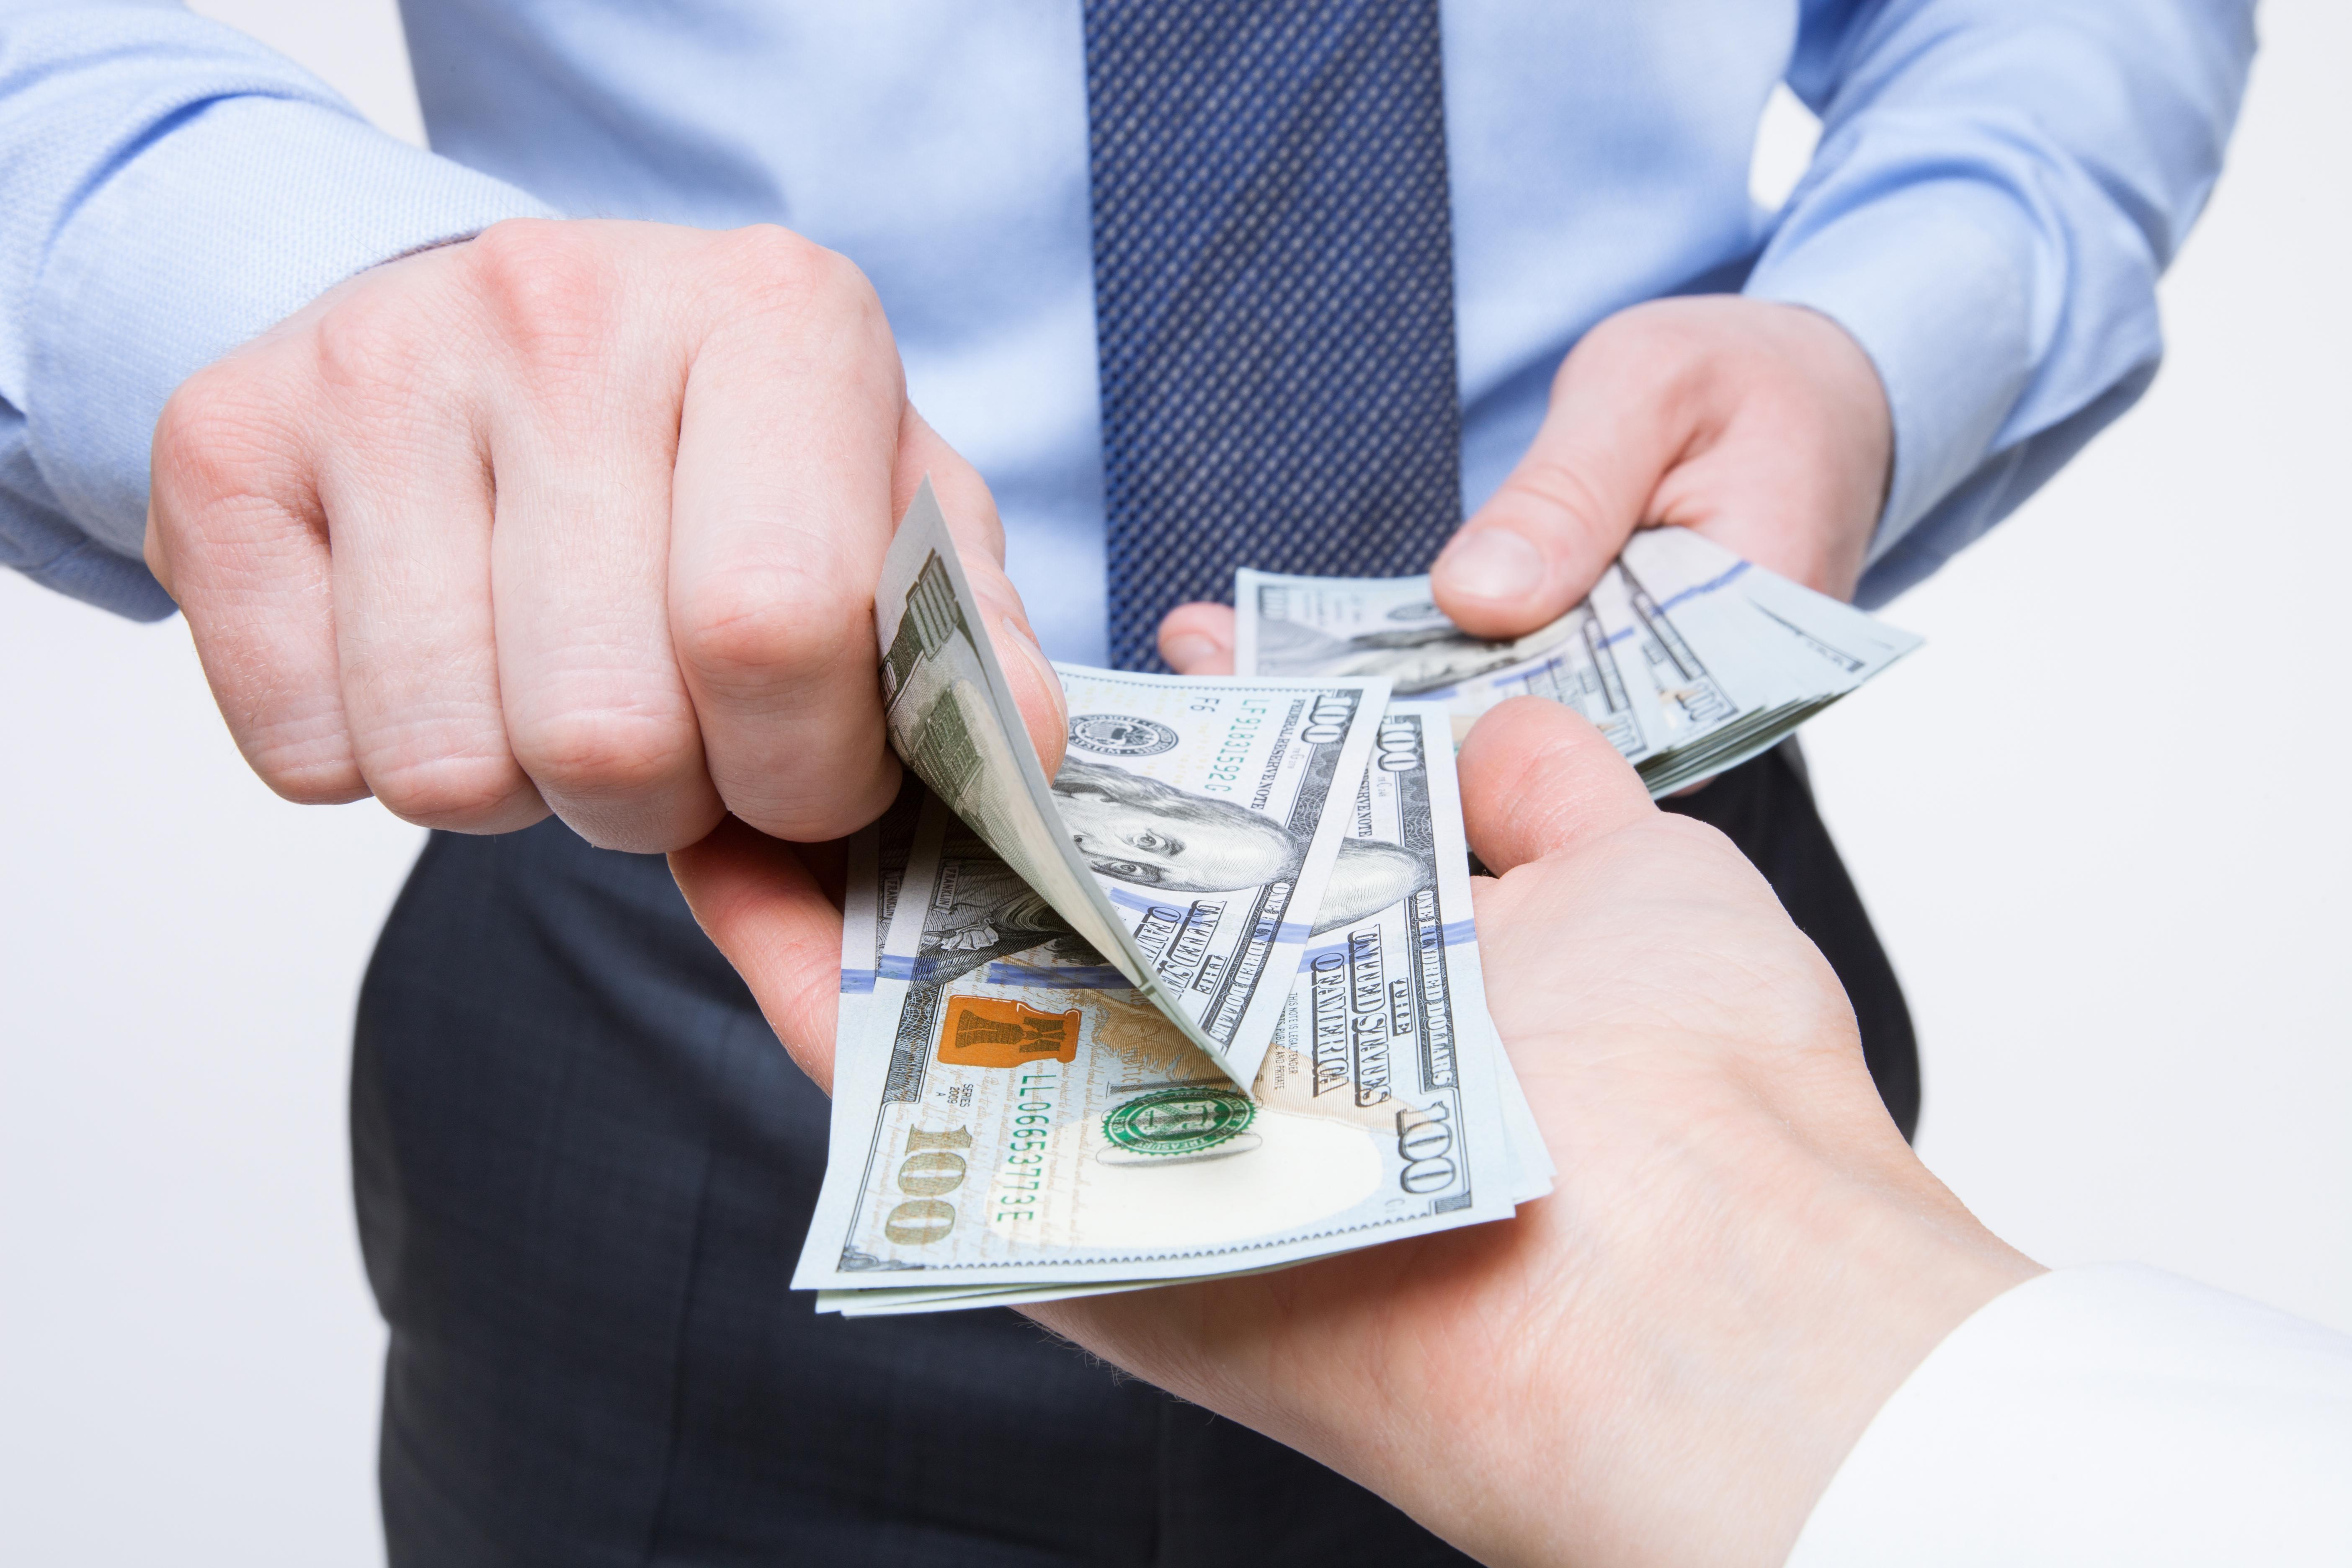 A person in business attire handing over $100 bills